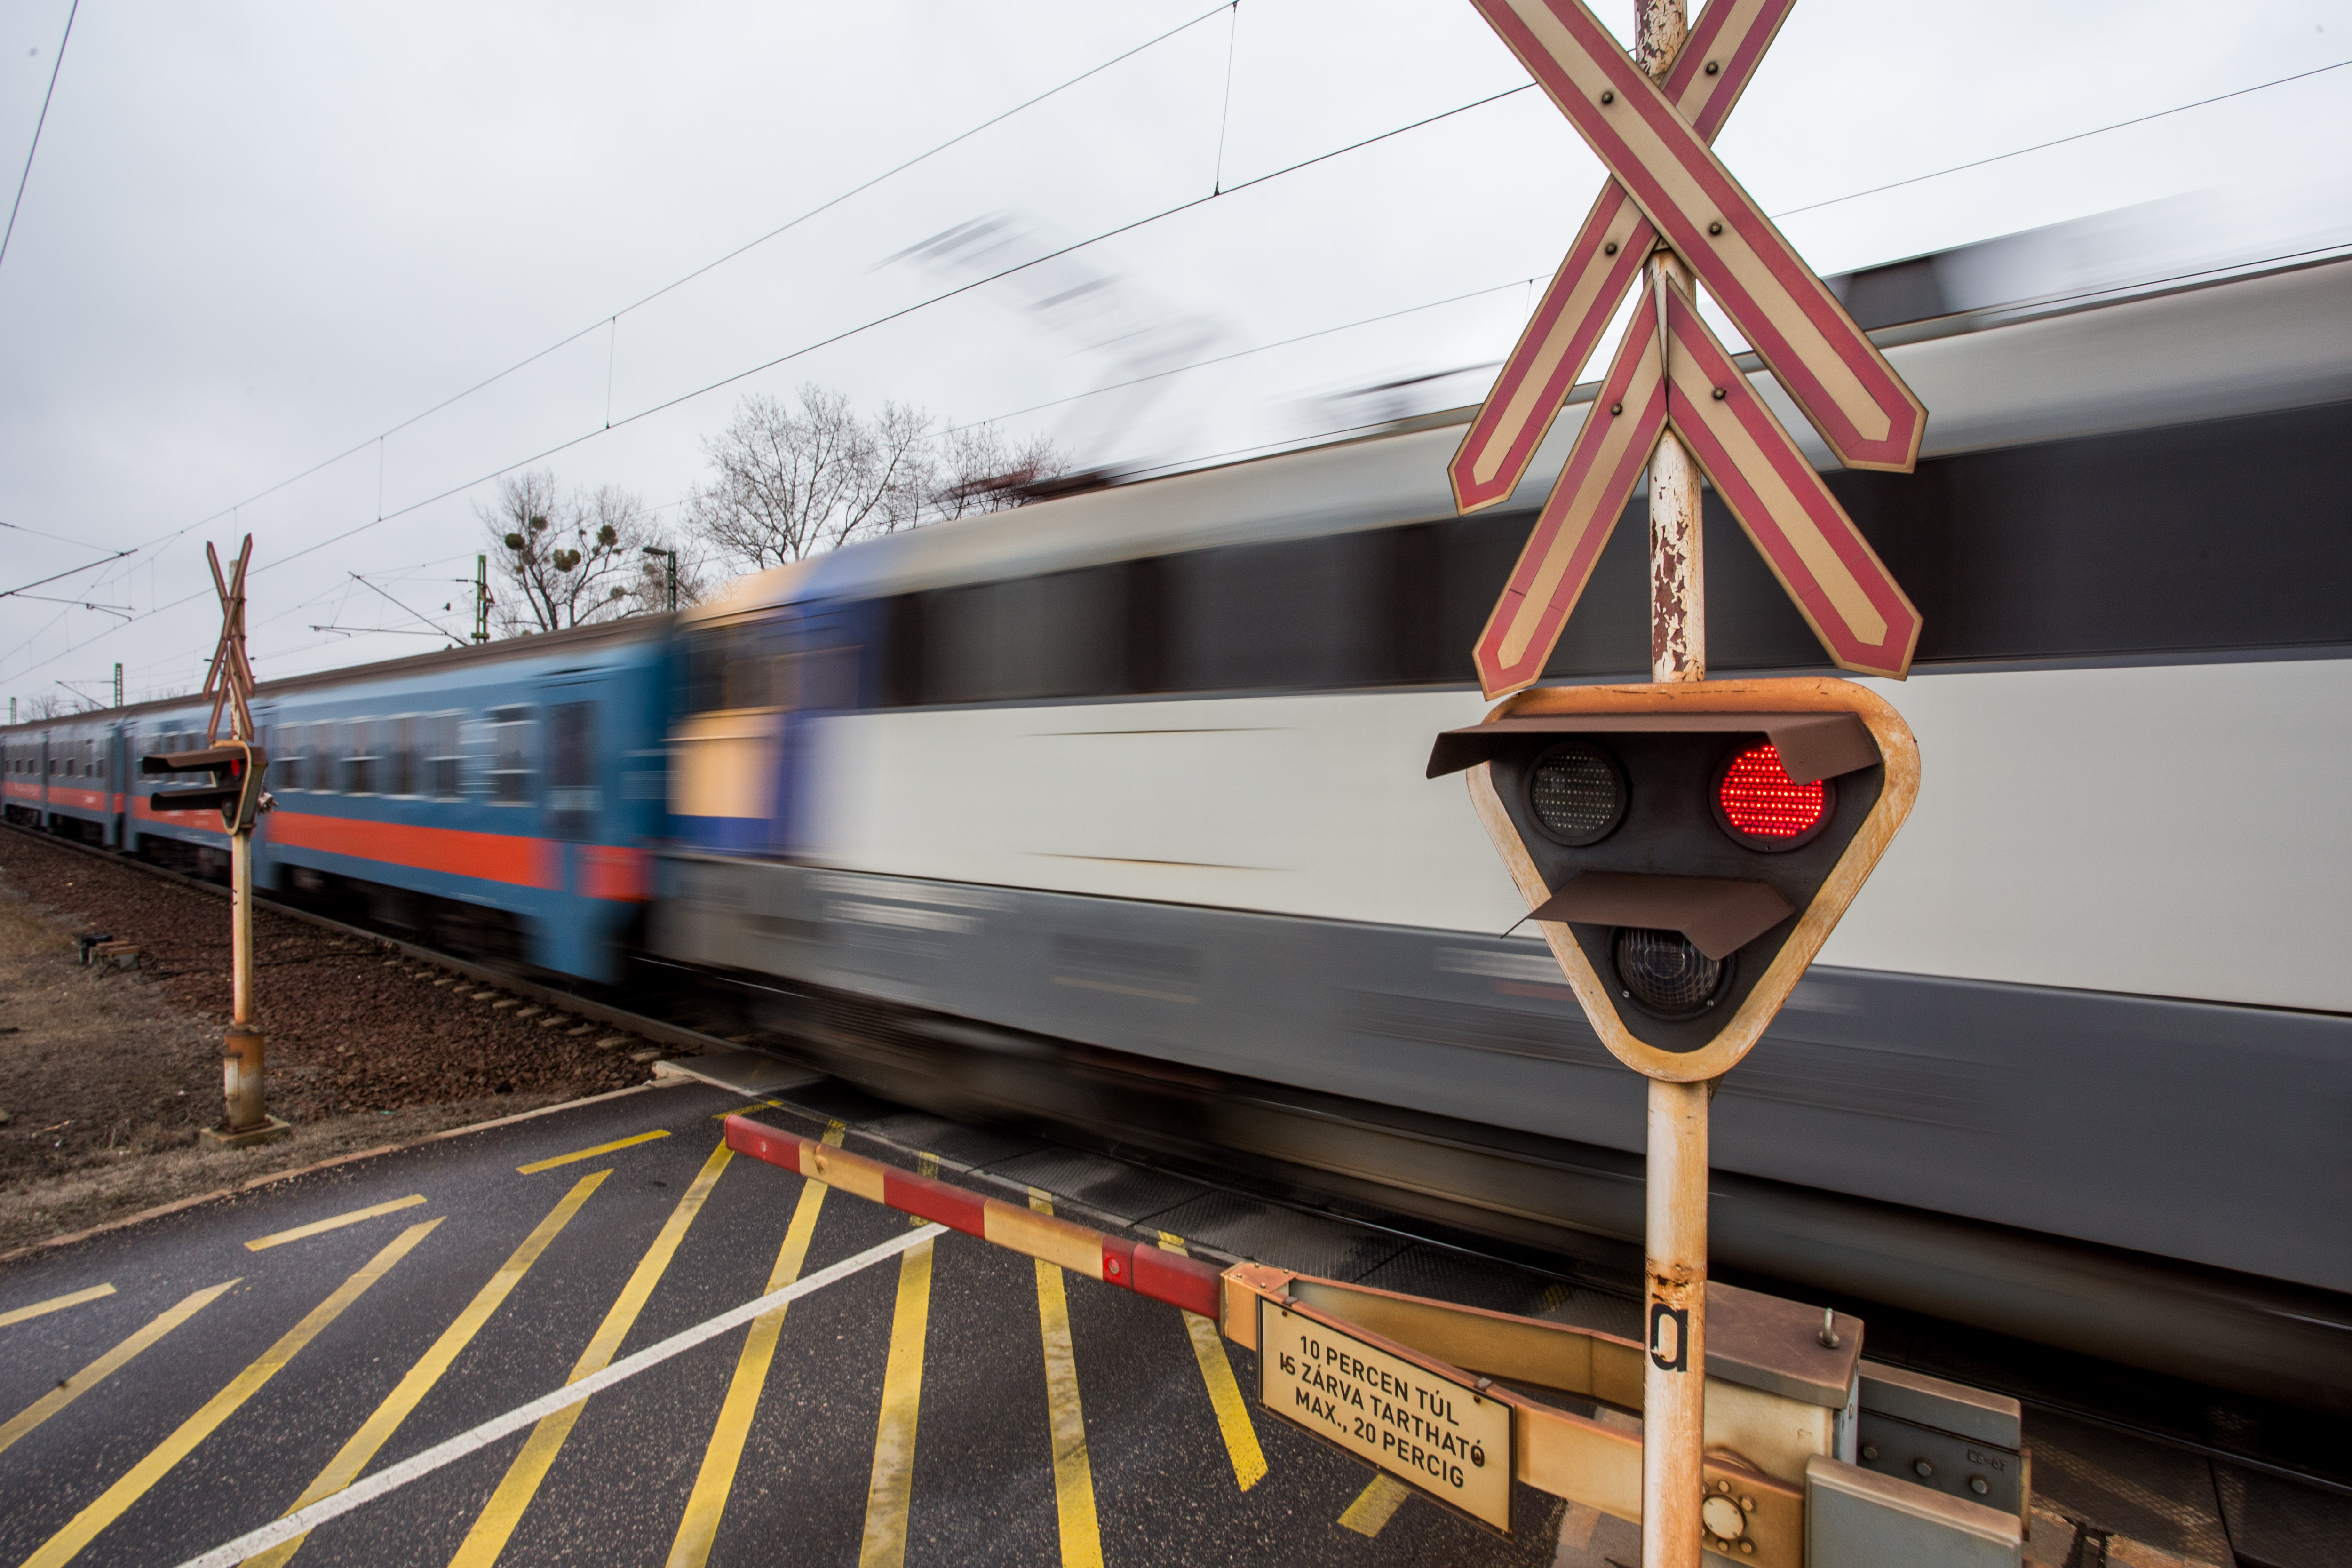 Vonattal is le lehet majd utaznia a tengerpartra.